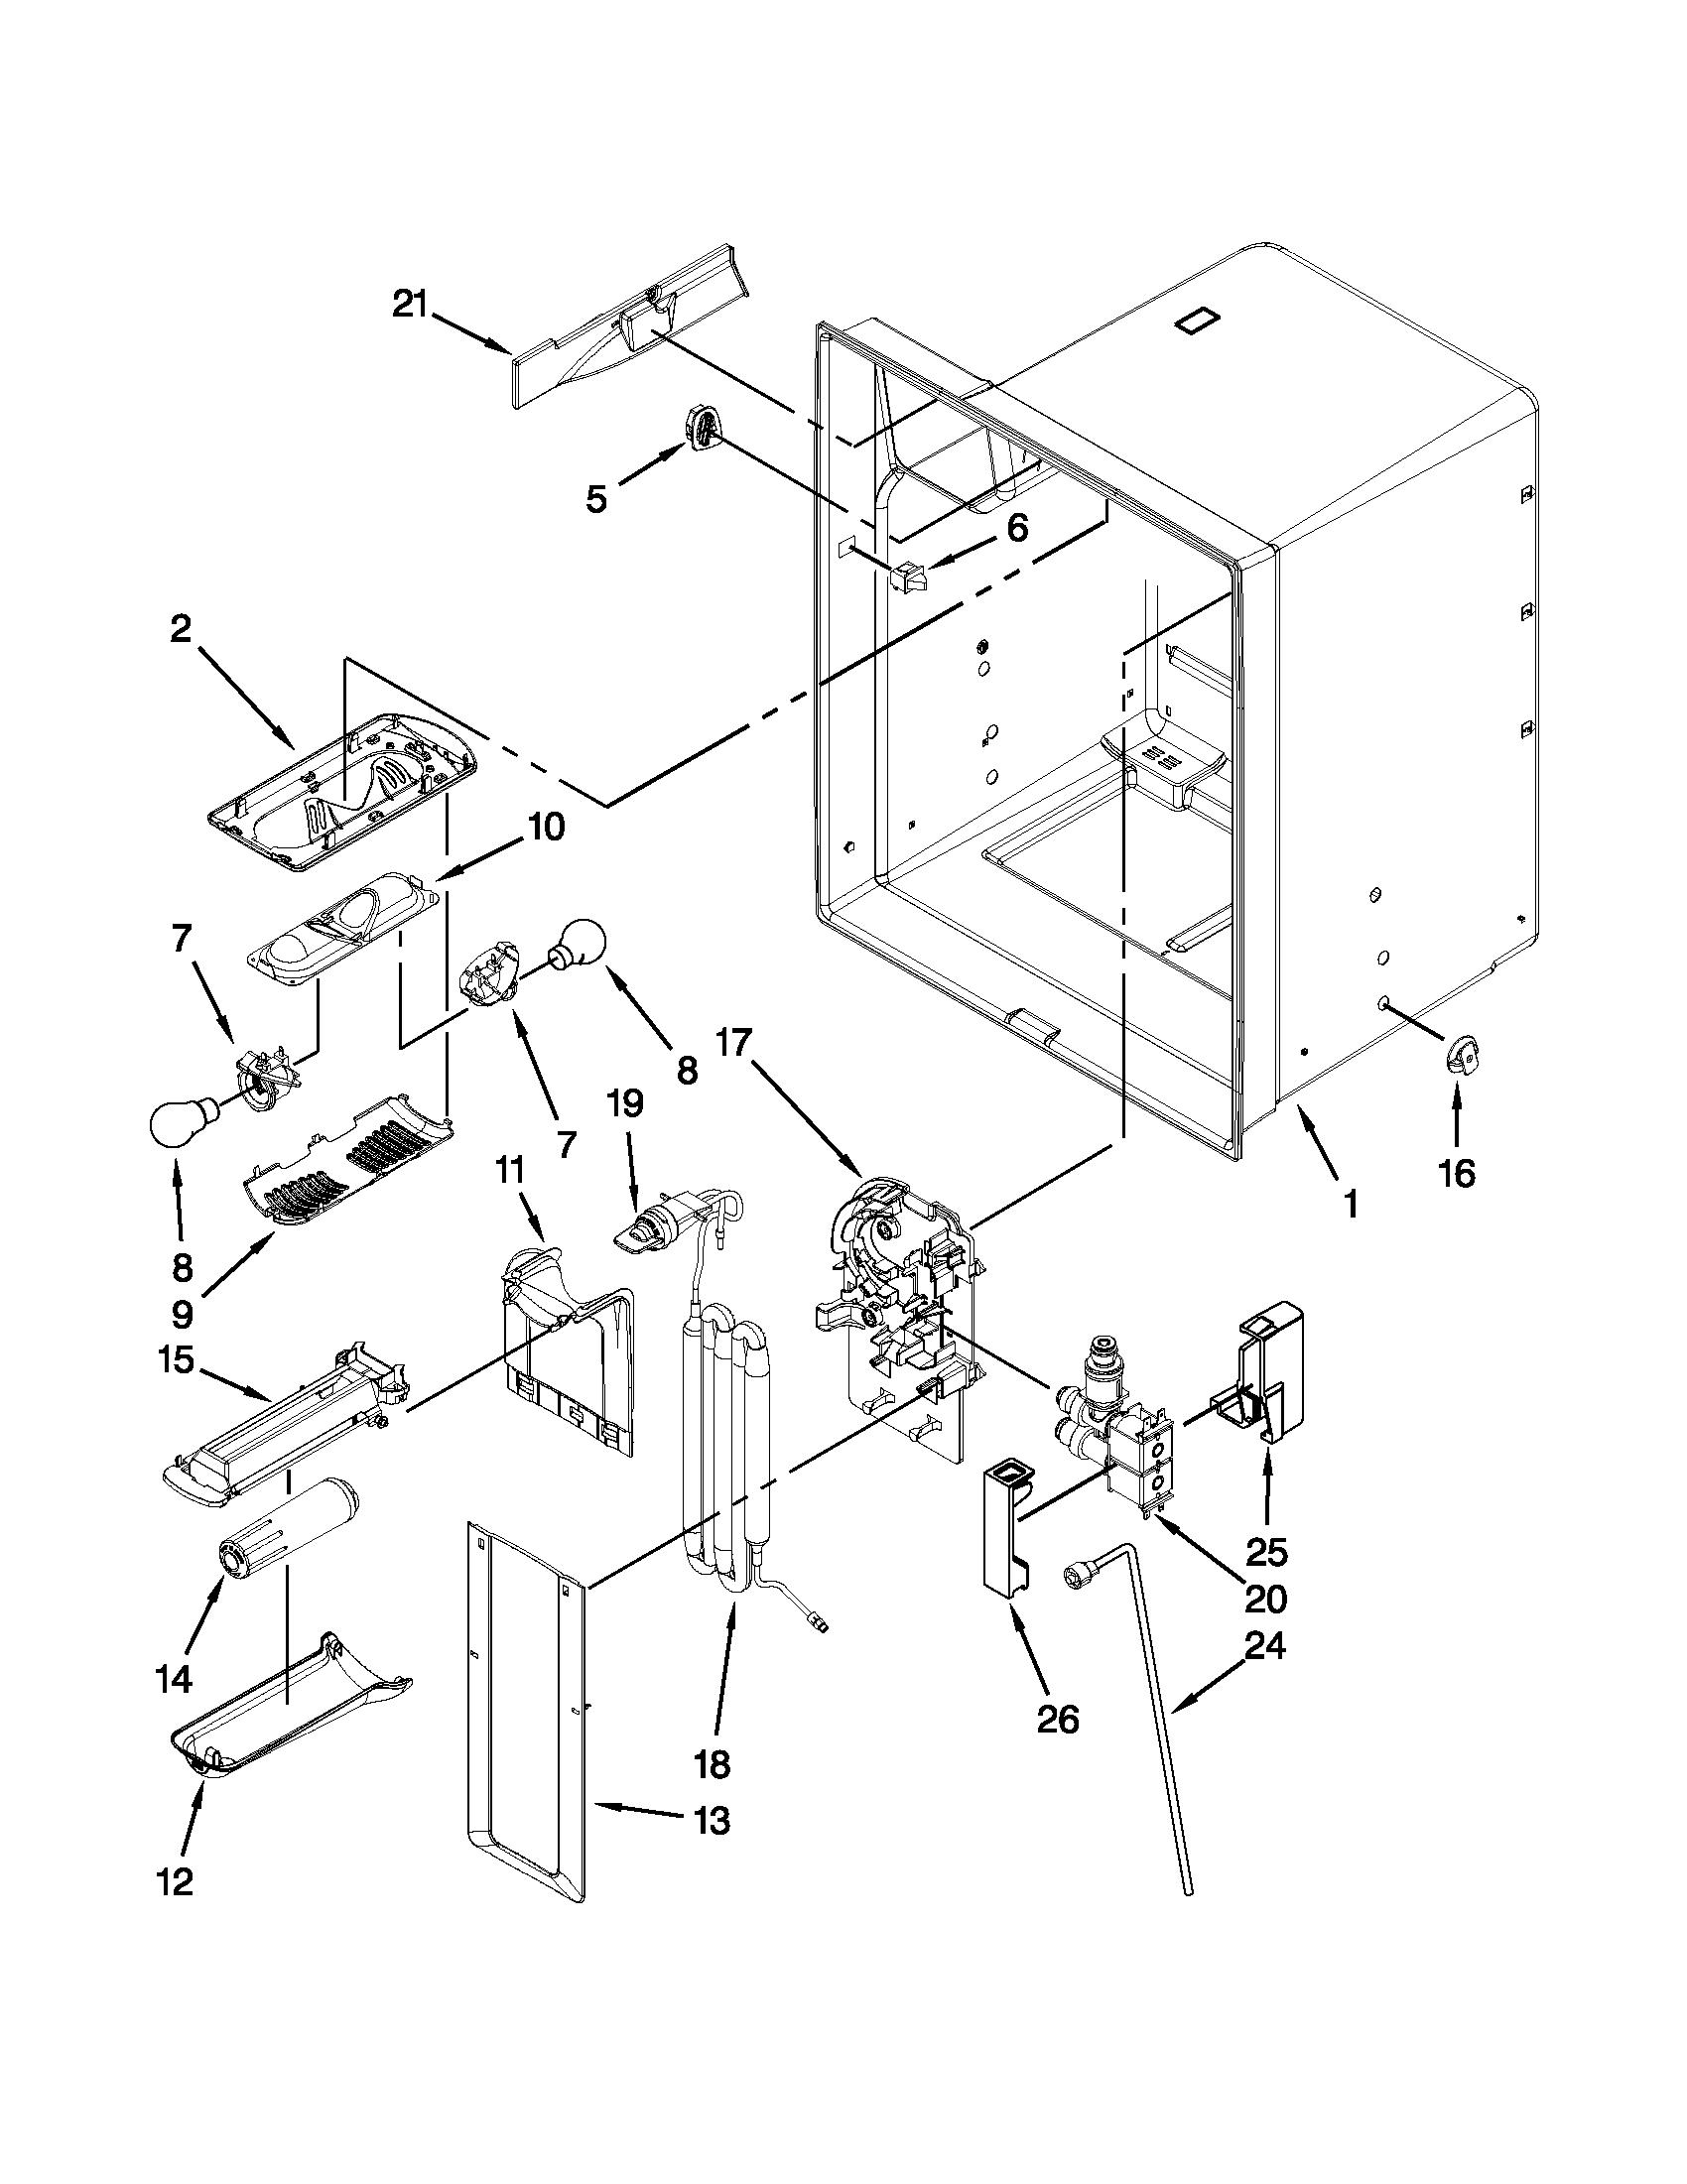 whirlpool gold refrigerator parts diagram citroen c4 boot wiring 36